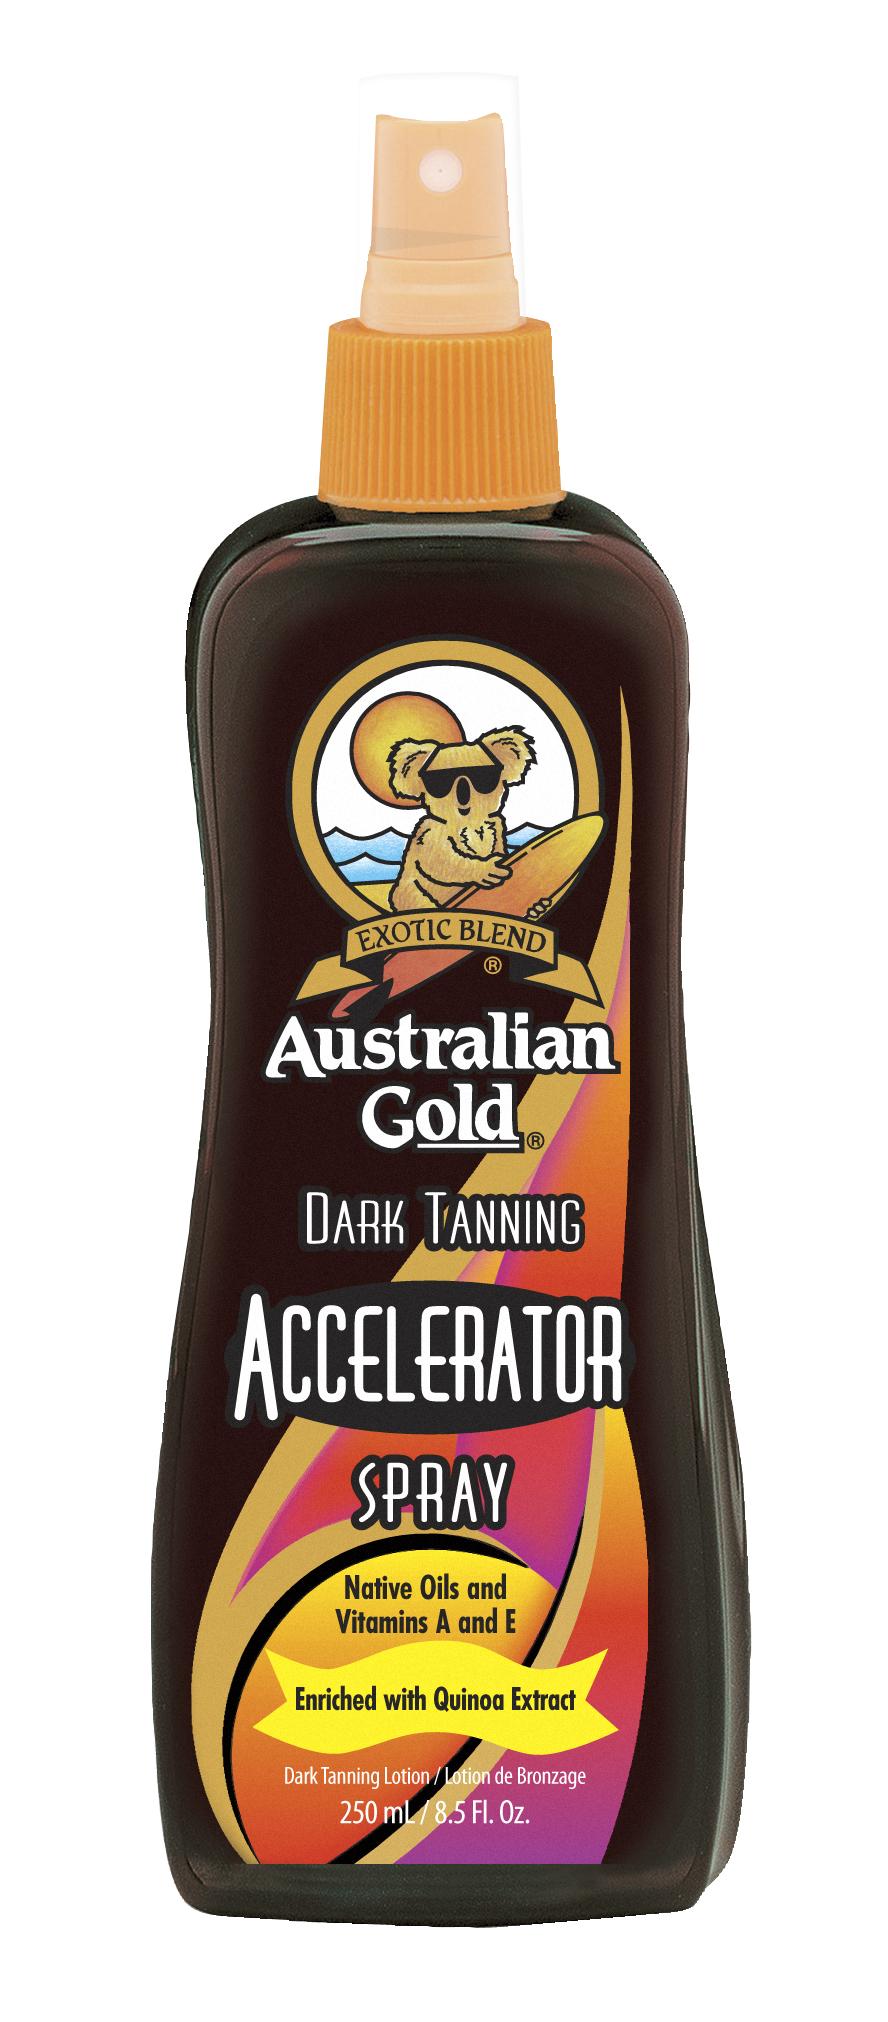 Accelerator™ Spray Reformulated with Quinoa Extract